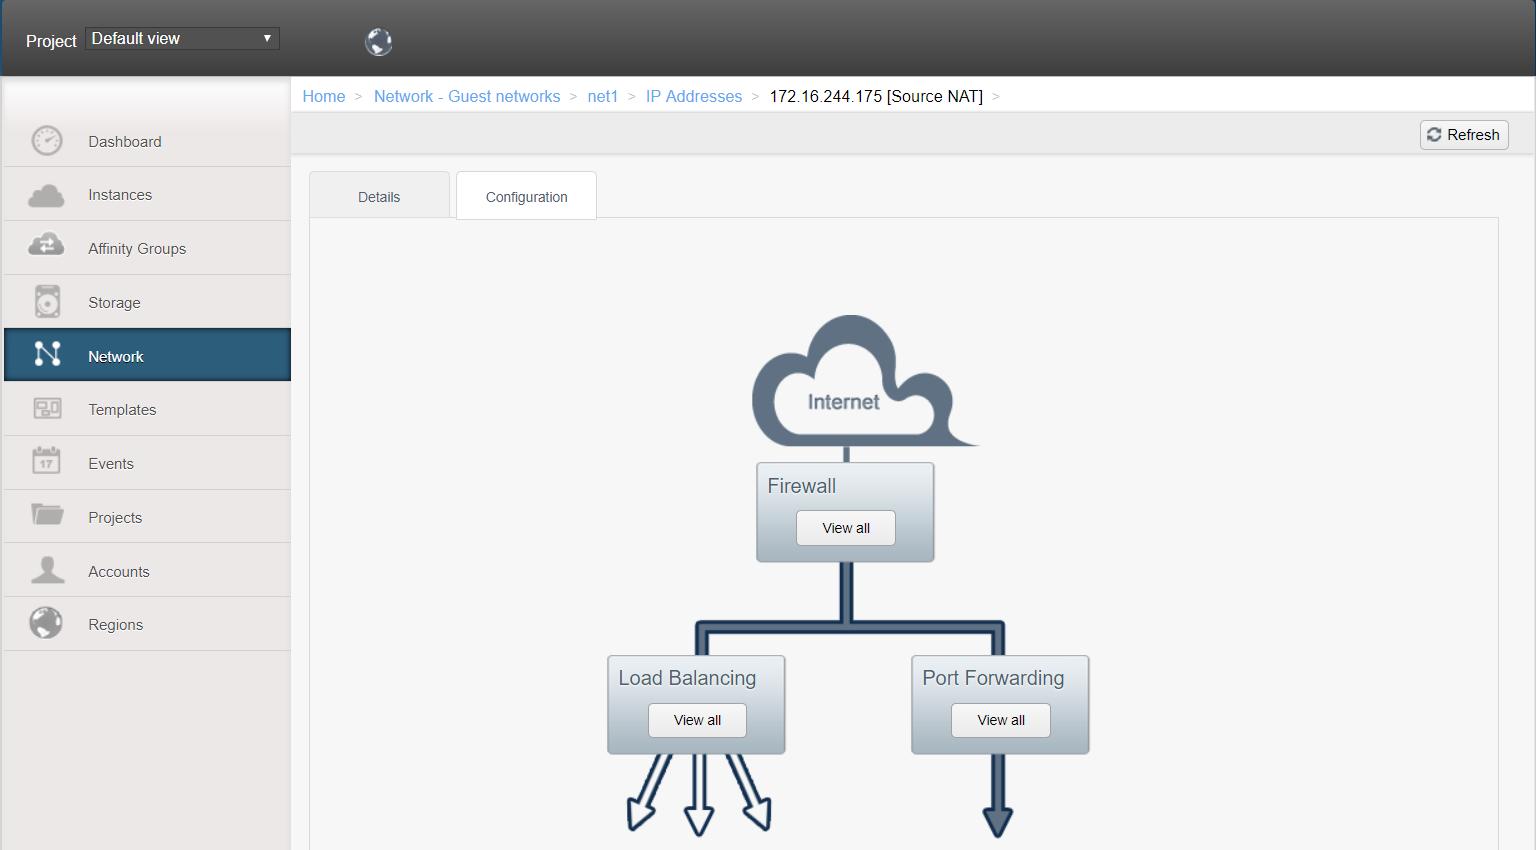 documentacion/ExpliClas/images/NetworkNAT.PNG